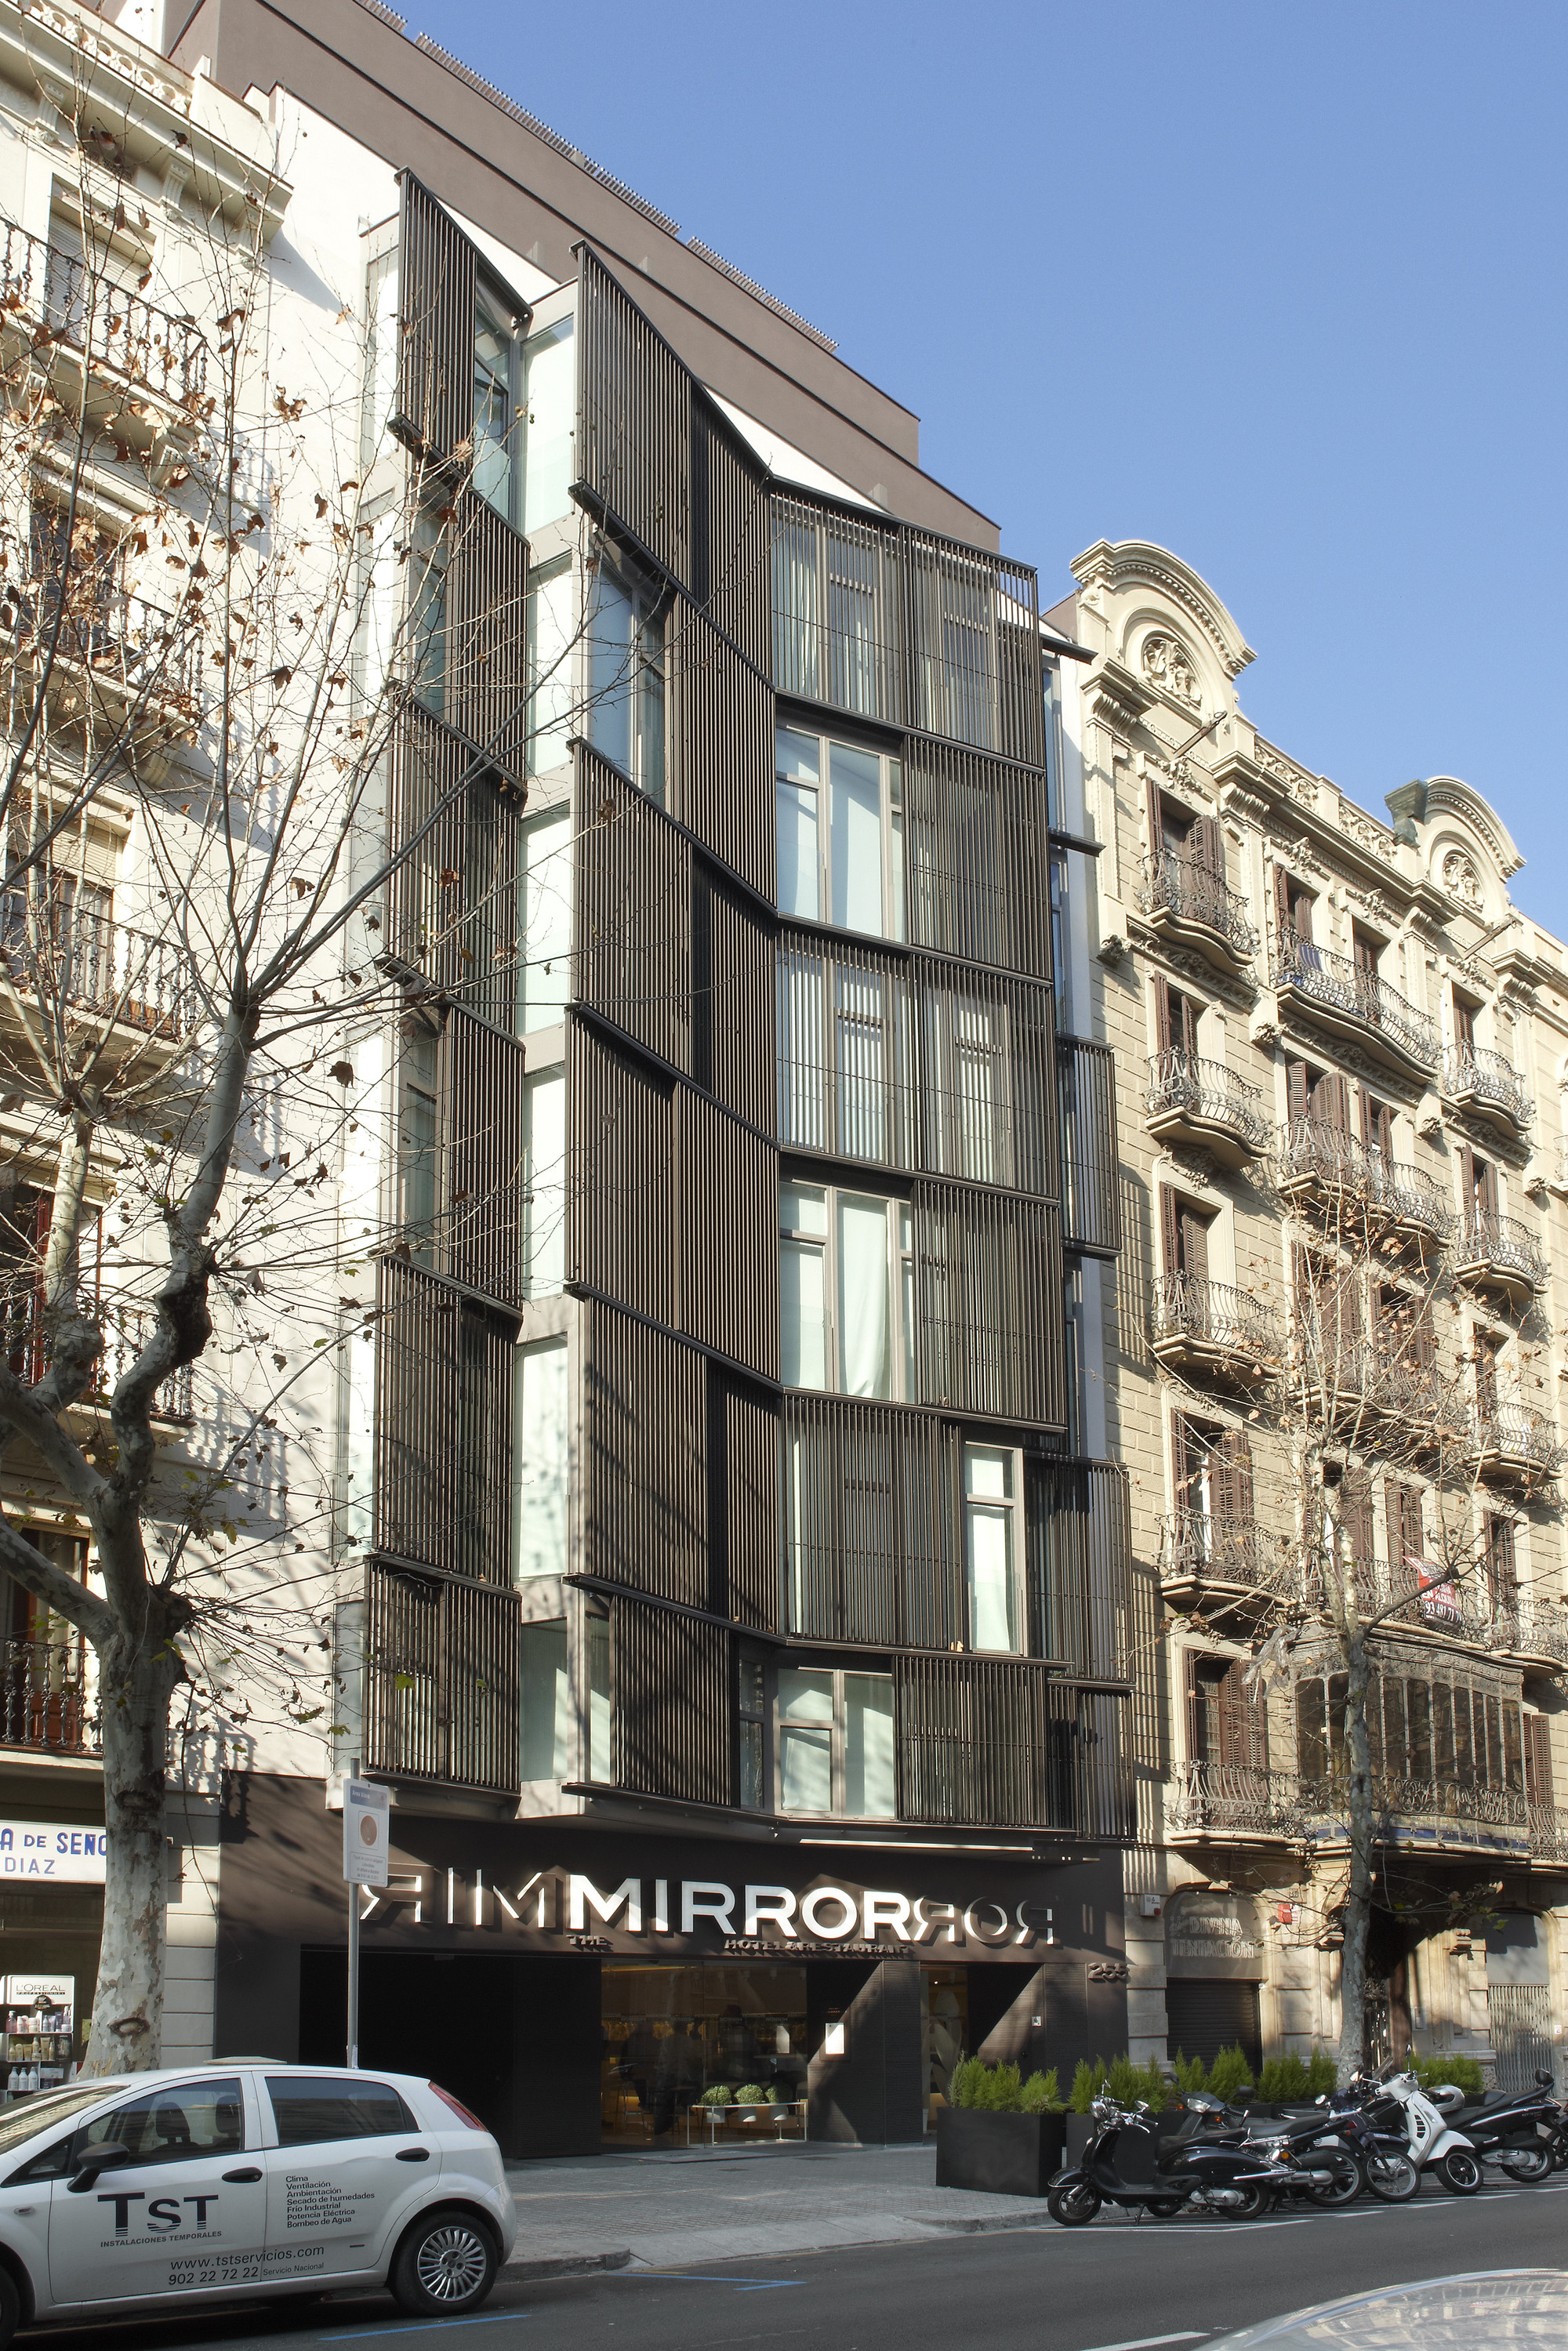 Mirror Hotel Barcelona